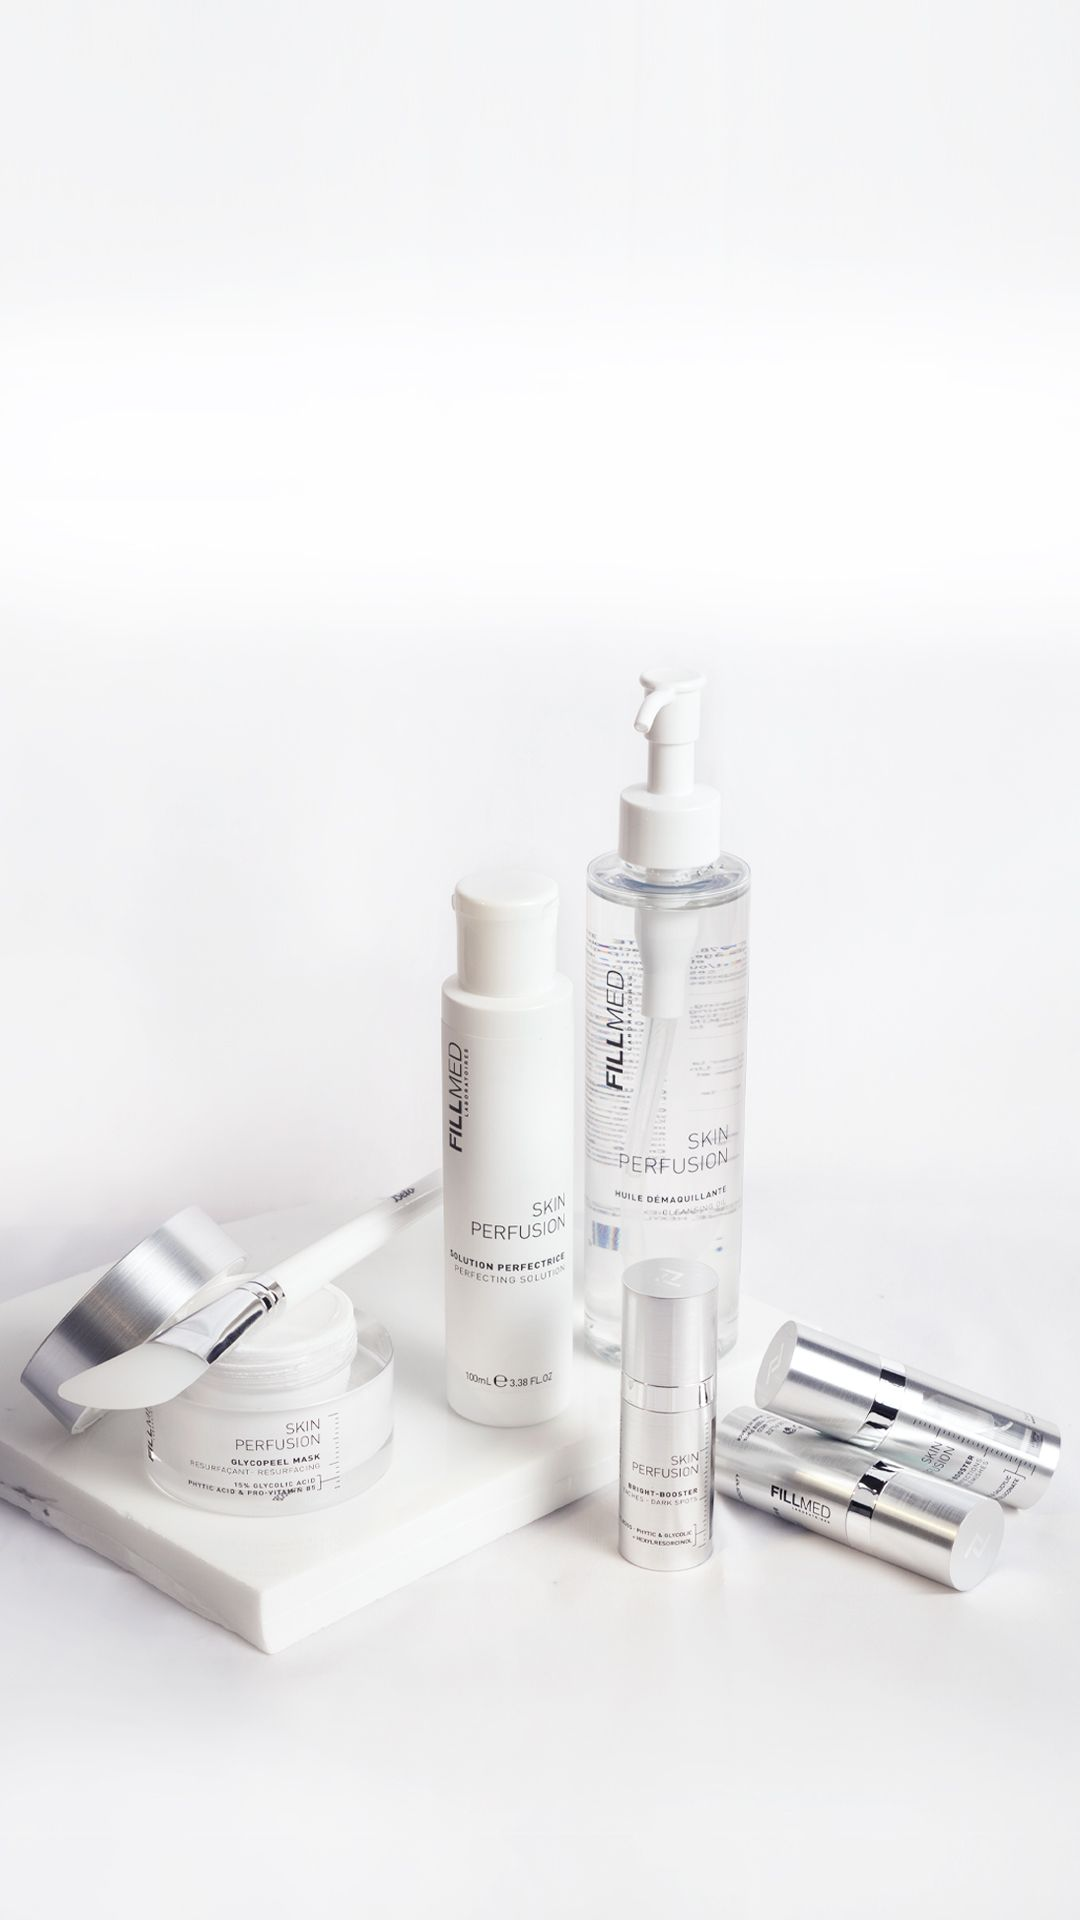 Bright BOOST Skin Perfusion Kit